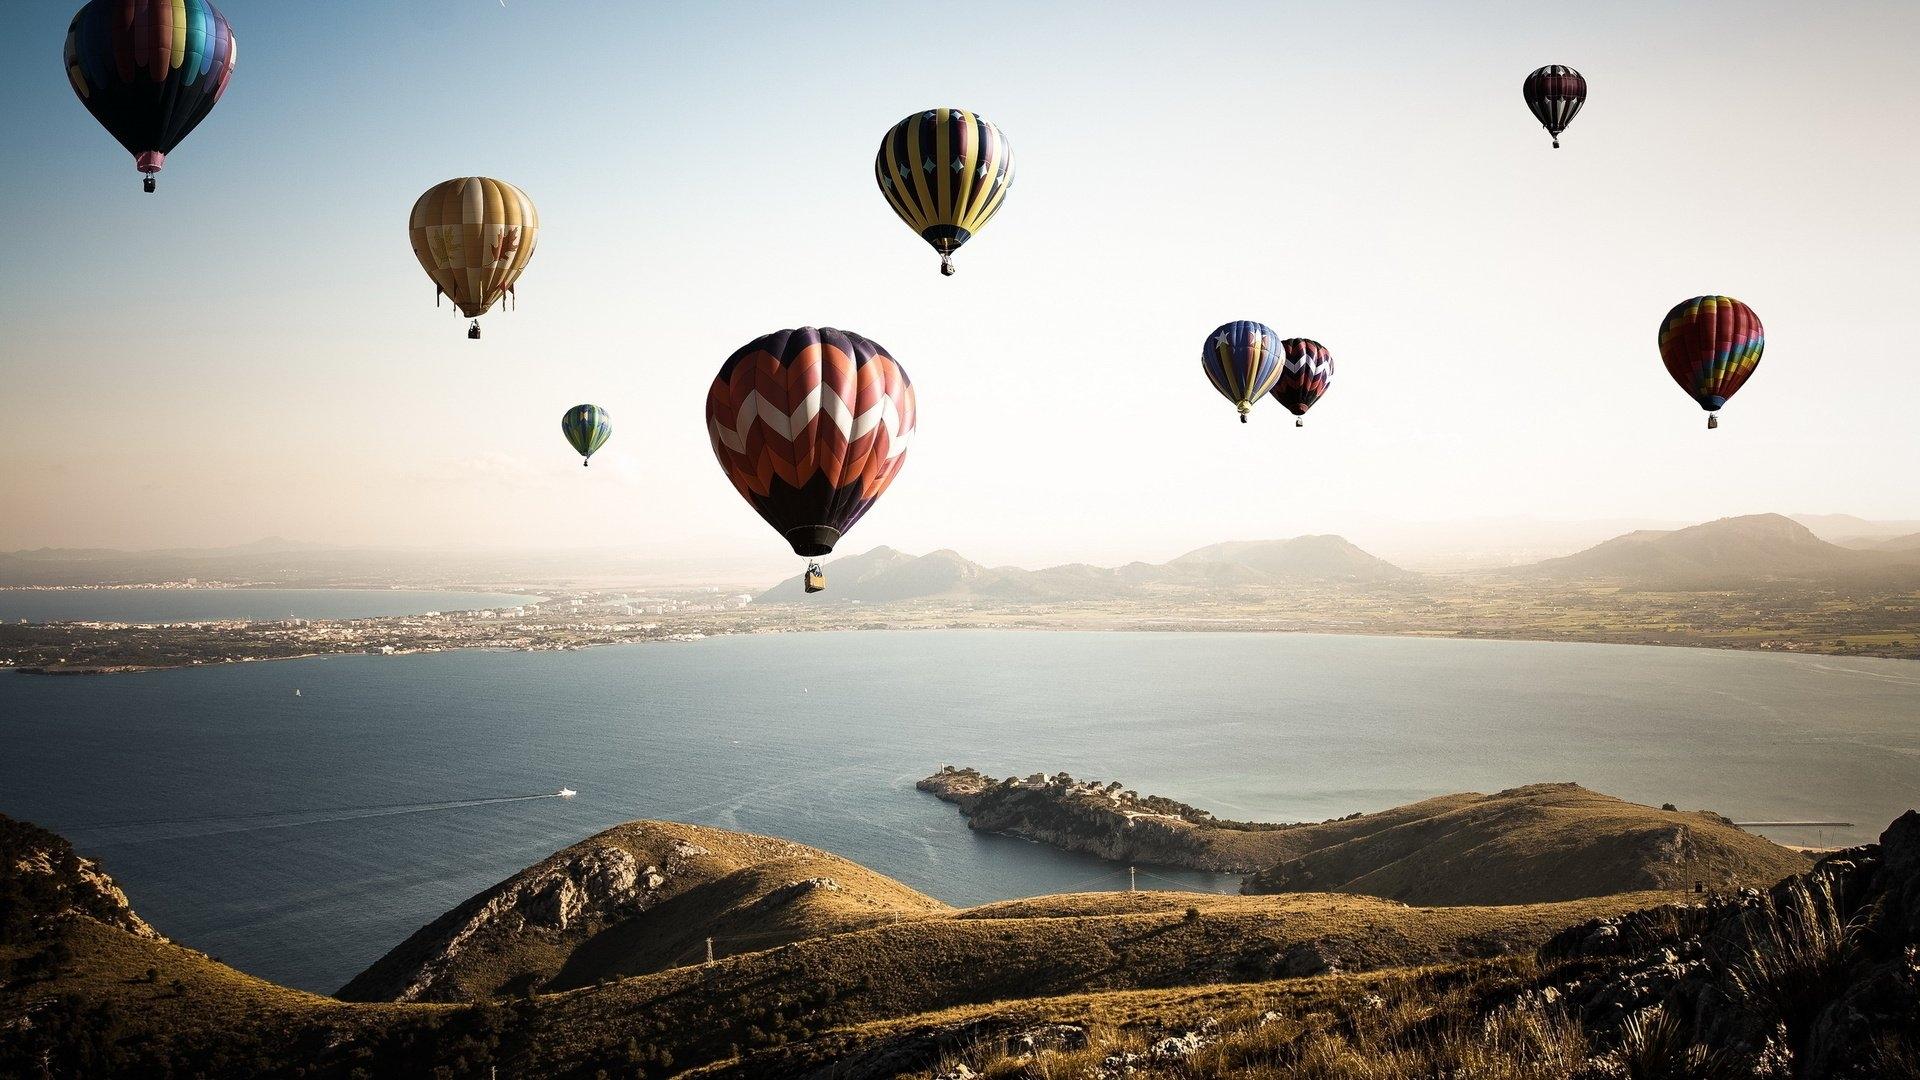 Air Balloon wallpaper for desktop